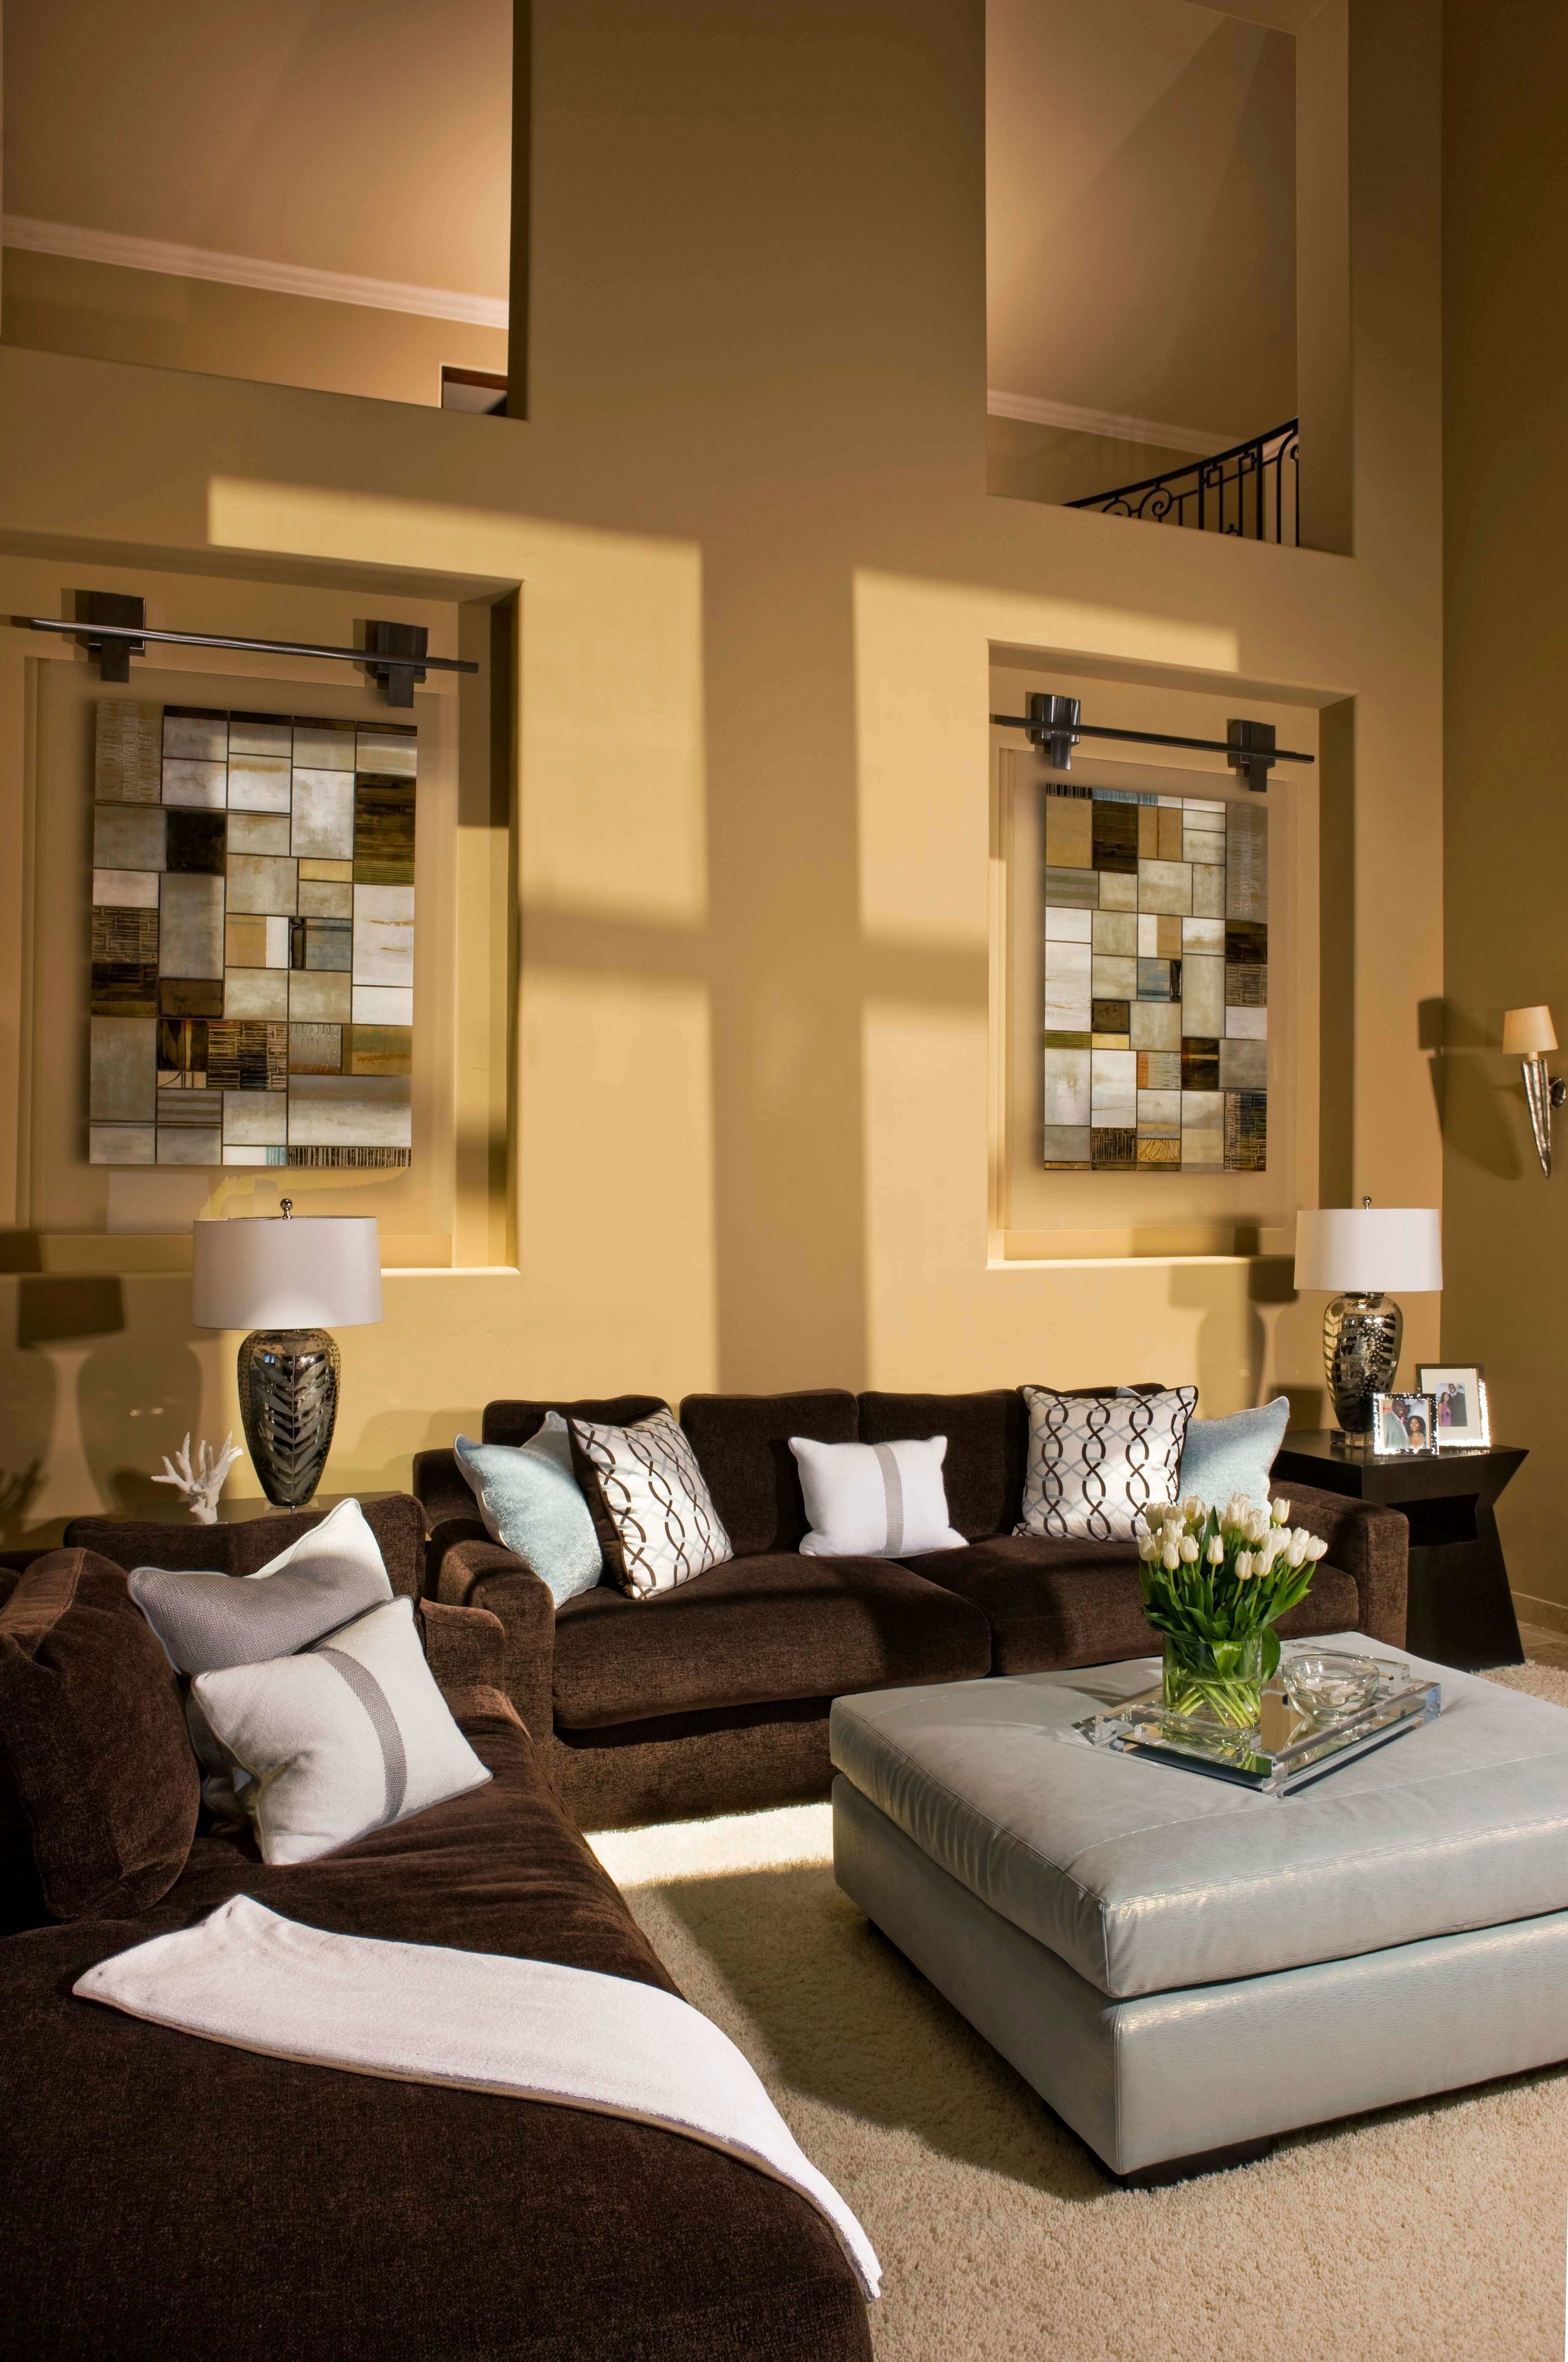 elizabeth-tapper-interiors-ritz-cove-laguna-formal-living-room-sitting-area.jpg